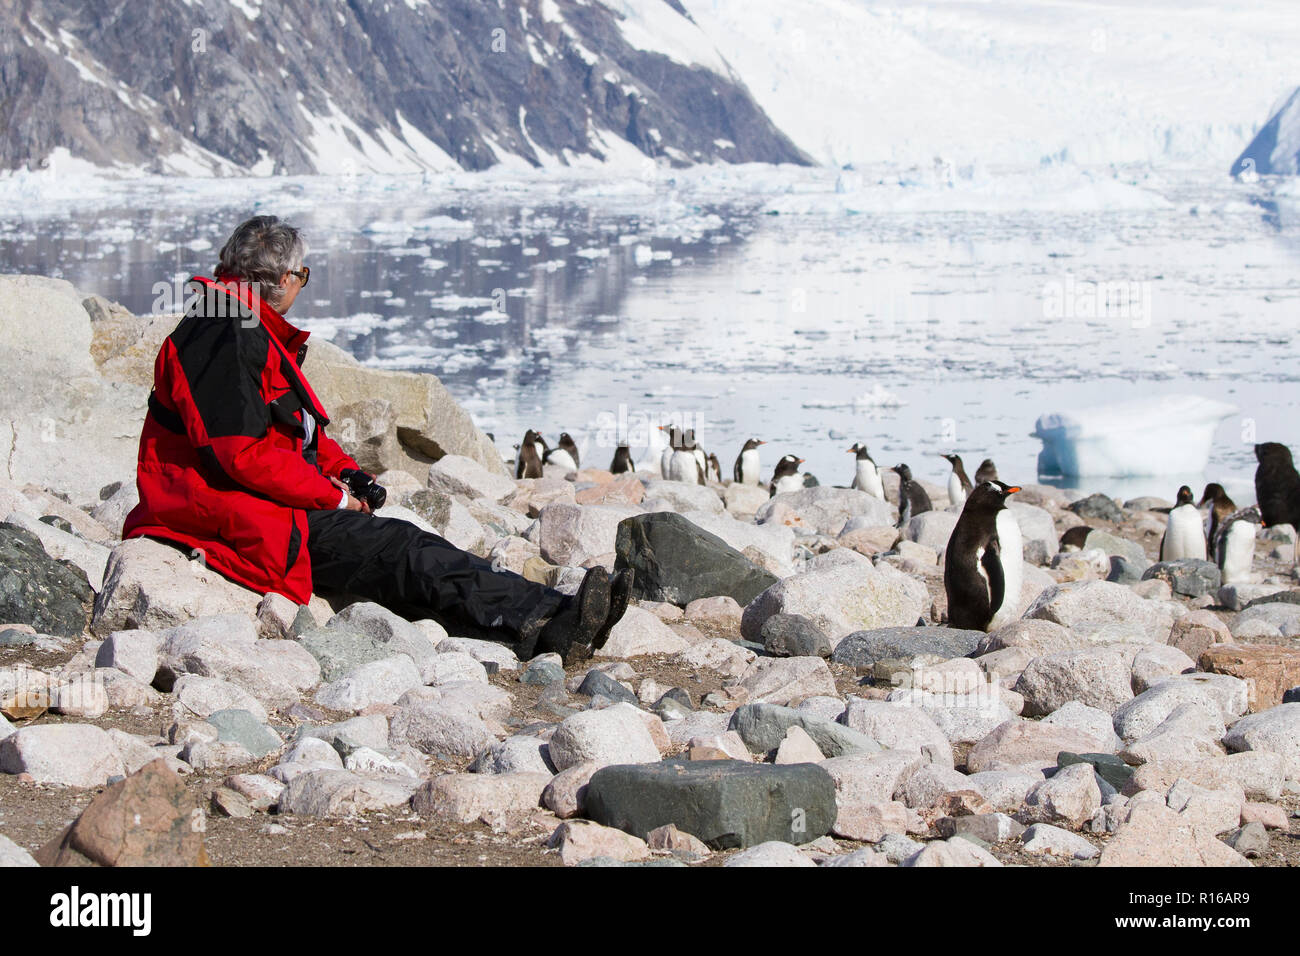 Antarctica tourists with penguins in Antarctica landscape. - Stock Image